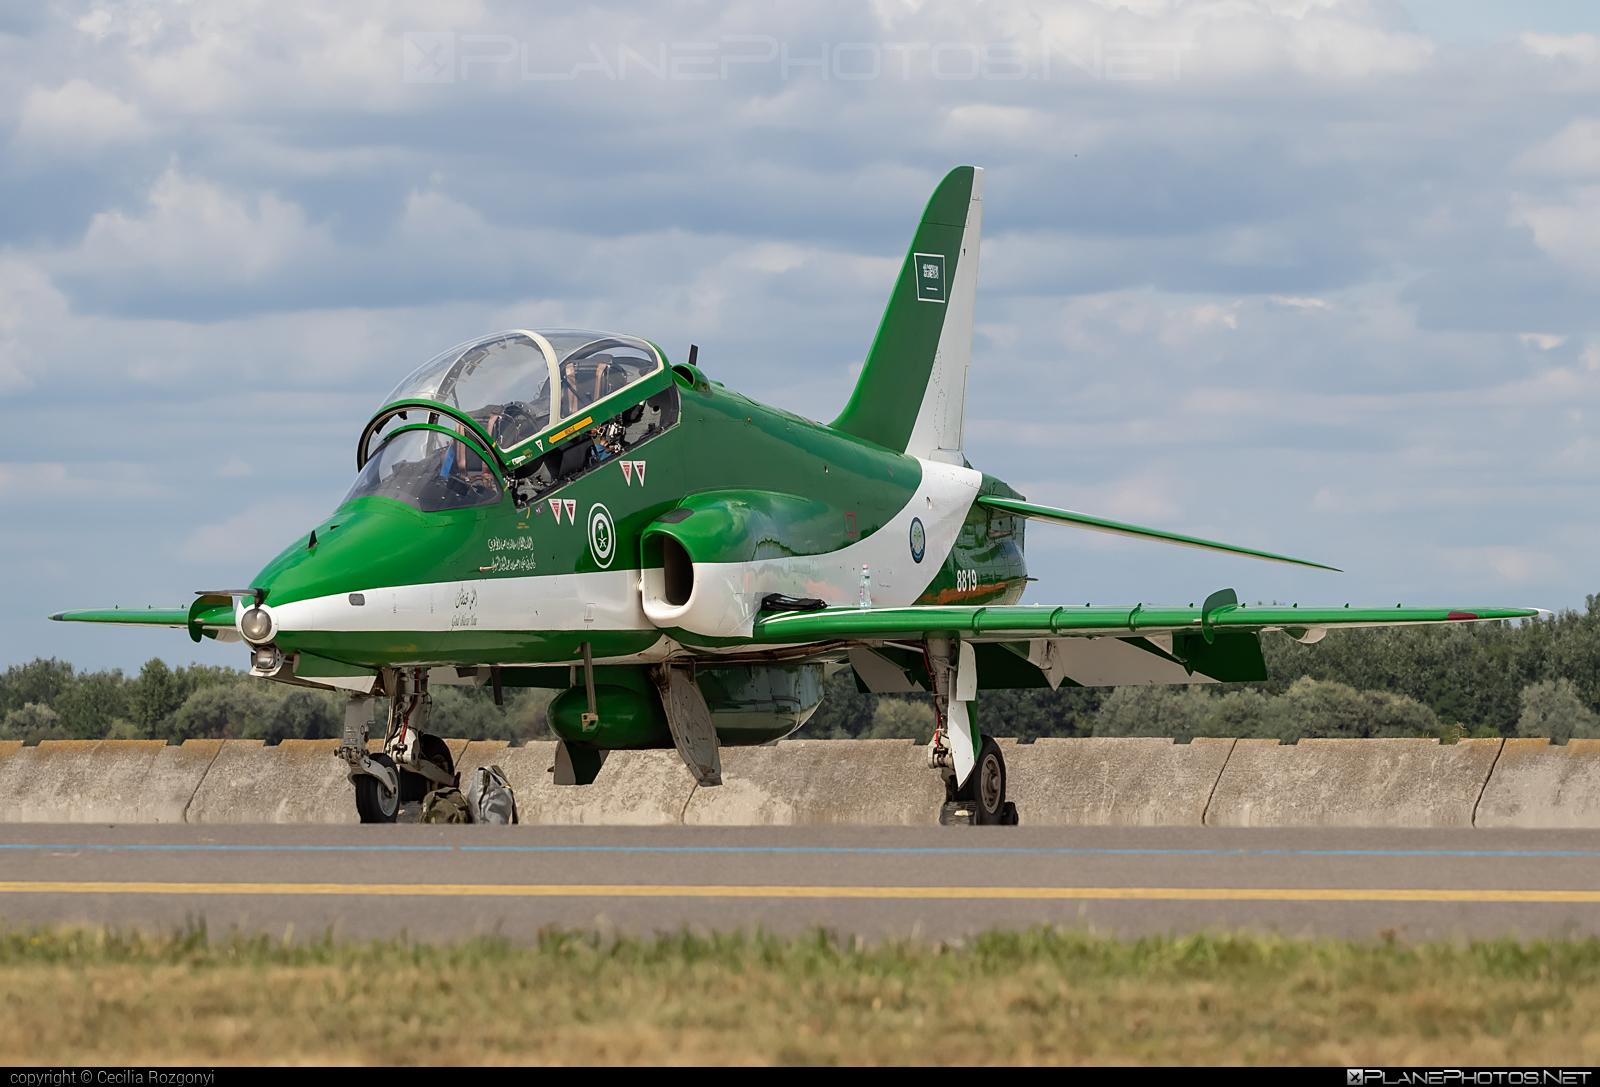 British Aerospace Hawk 65A - 8819 operated by Royal Saudi Air Force #RoyalSaudiAirForce #baehawk #britishaerospace #britishaerospacehawk #hawk65a #kecskemetairshow2021